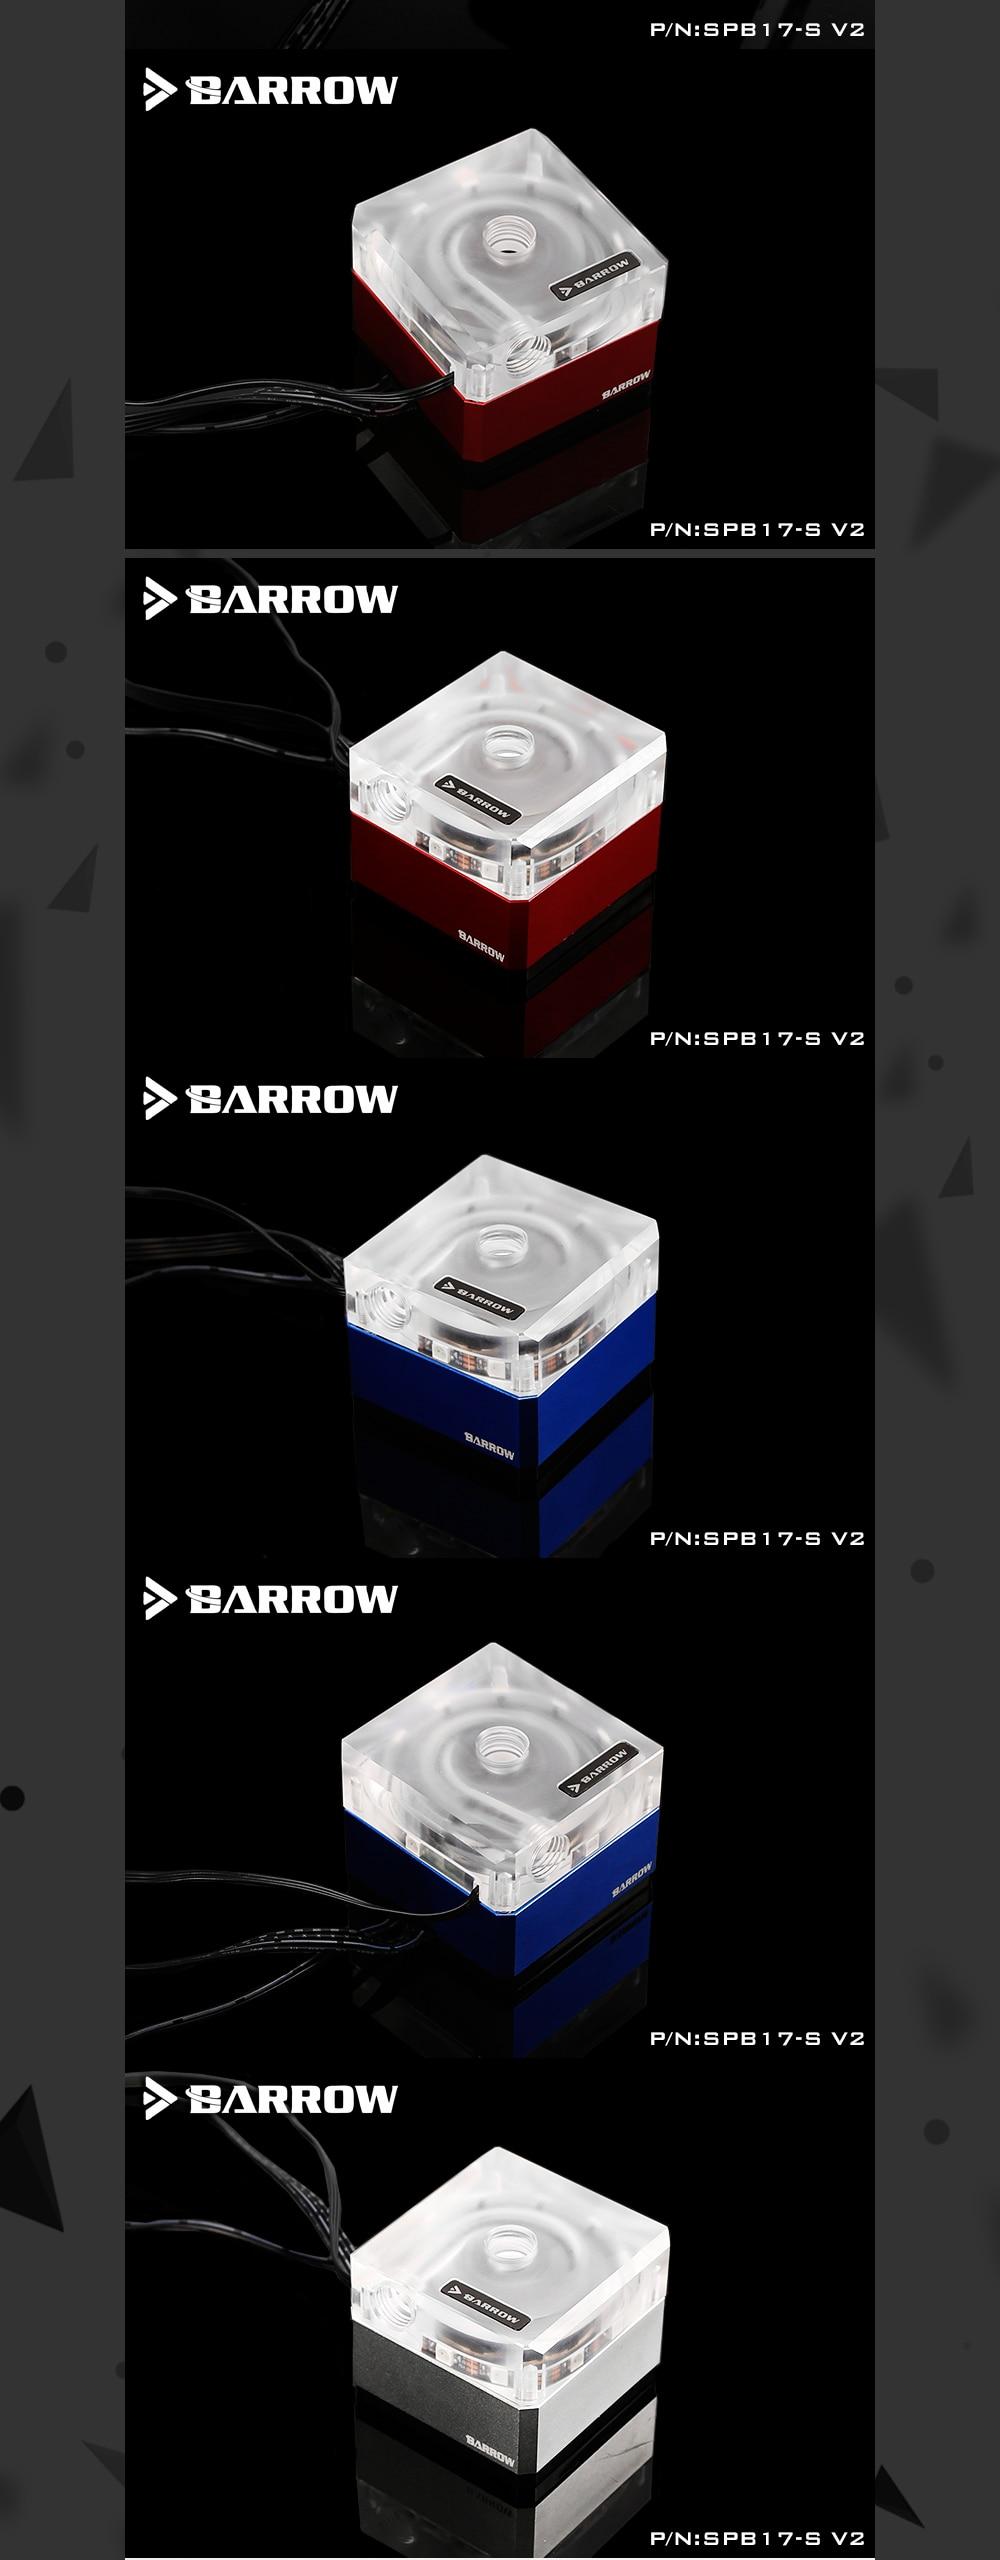 Barrow SPB17-S-V2, 17W PWM Pumps, LRC 2.0, DDC Series, Metal Shell, Manual And PWM Speed Control Water Cooling Pump